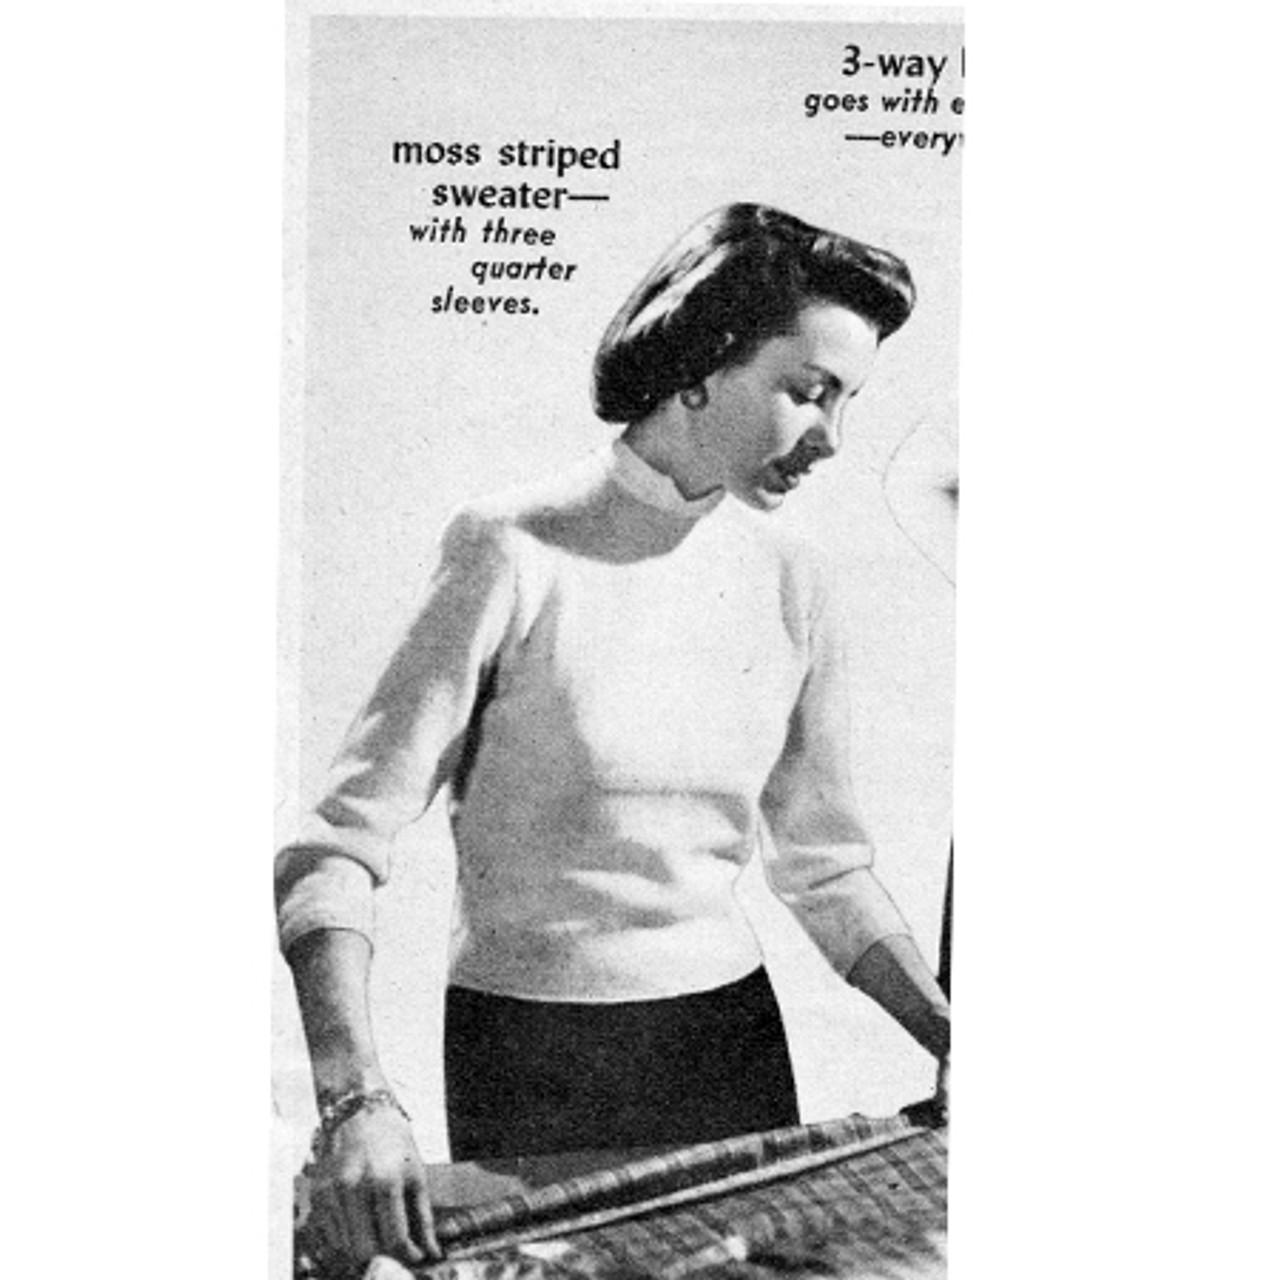 Vintage Moss Stripe Knitted Sweater Pattern